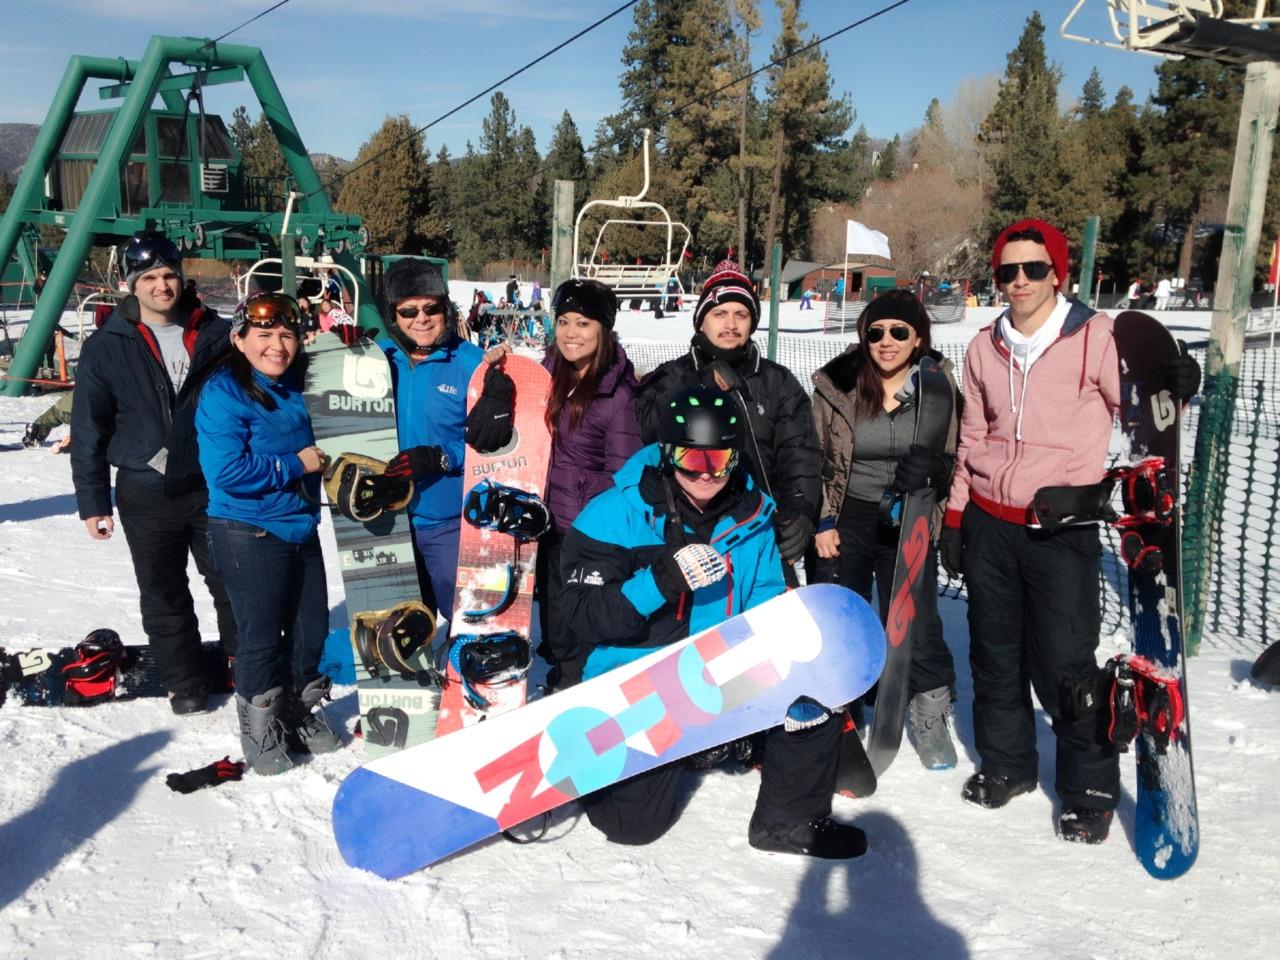 Dr U office staff snowboarding in Big Bear.